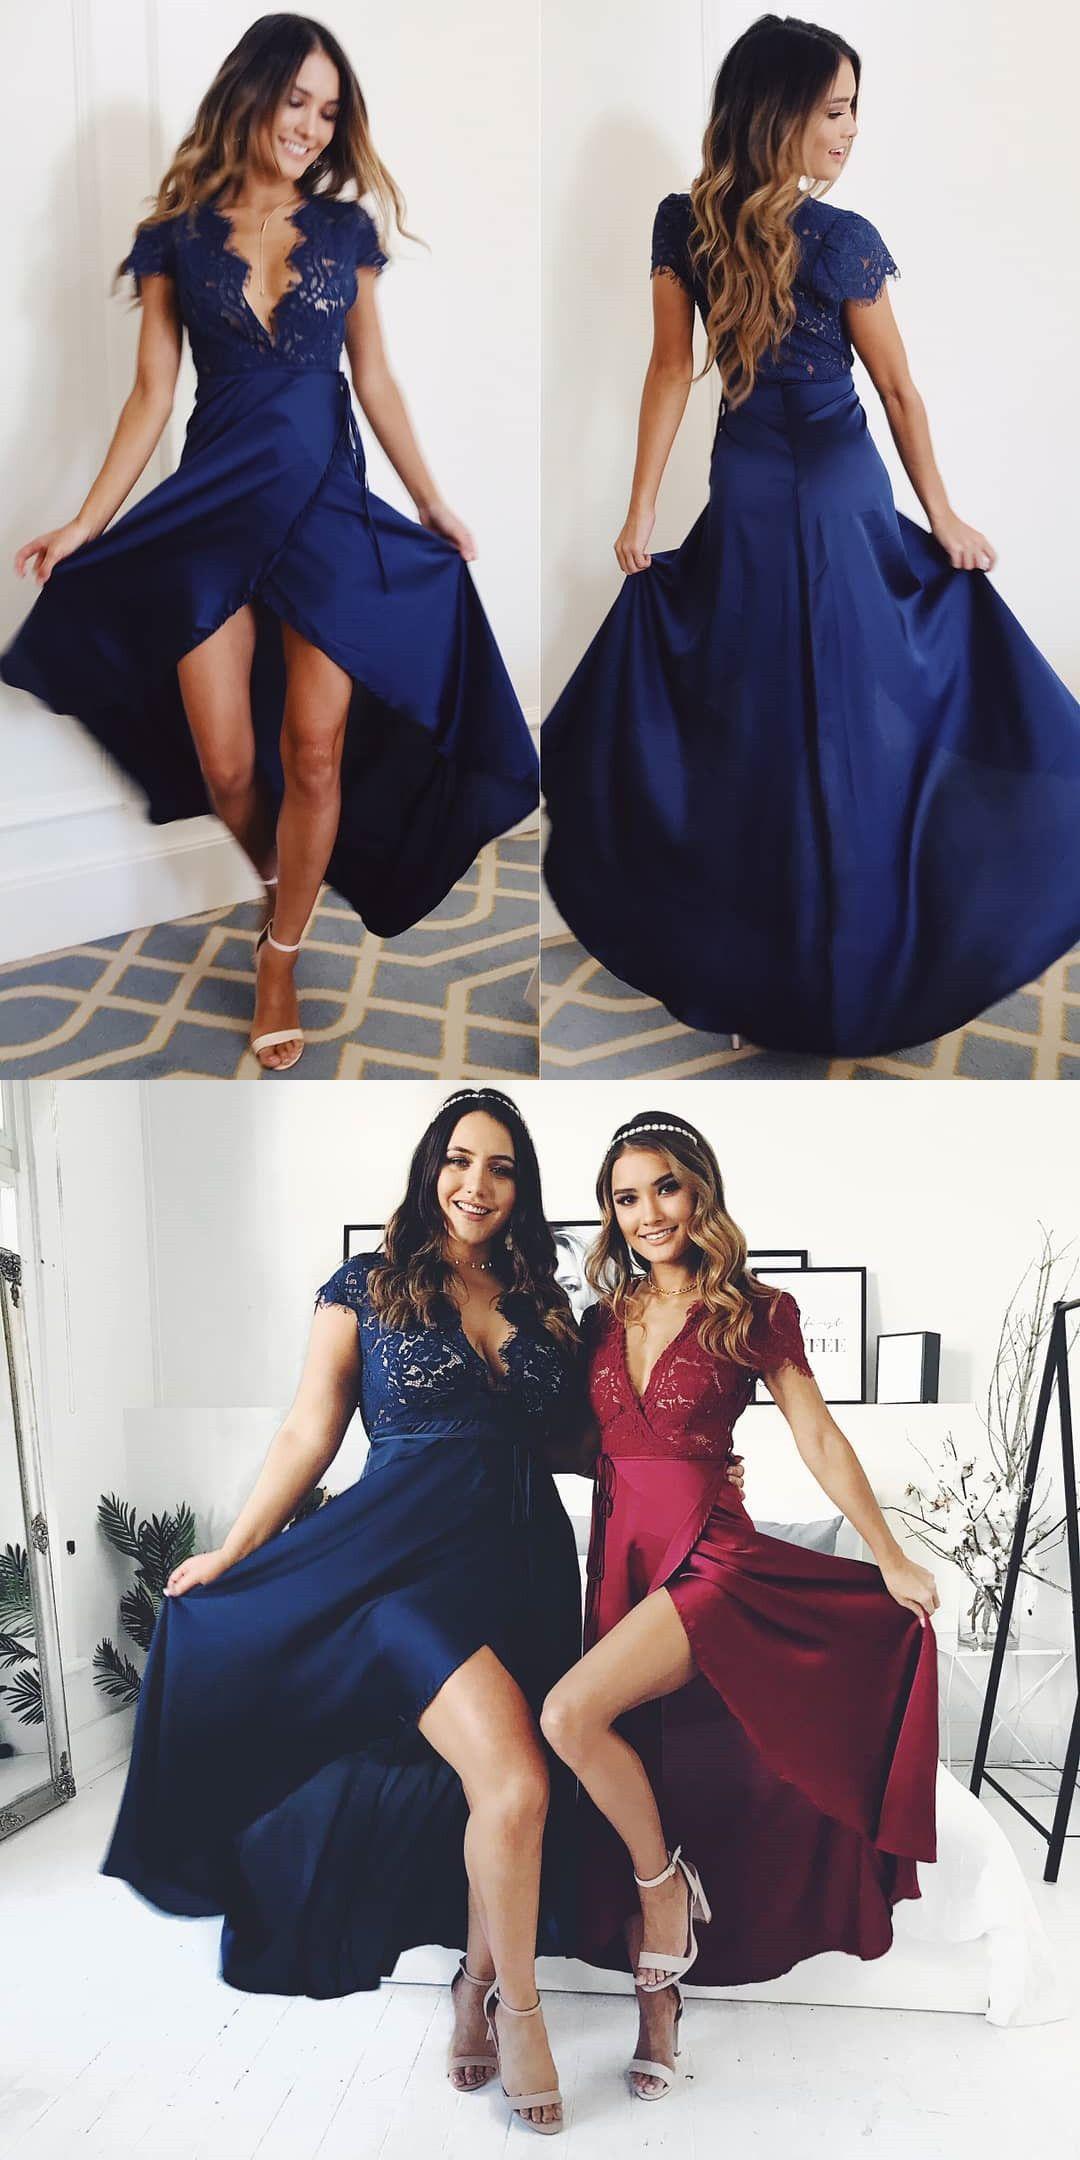 Cap Sleeves Navy Blue Long Prom Dress in 2019 | Dresses ...